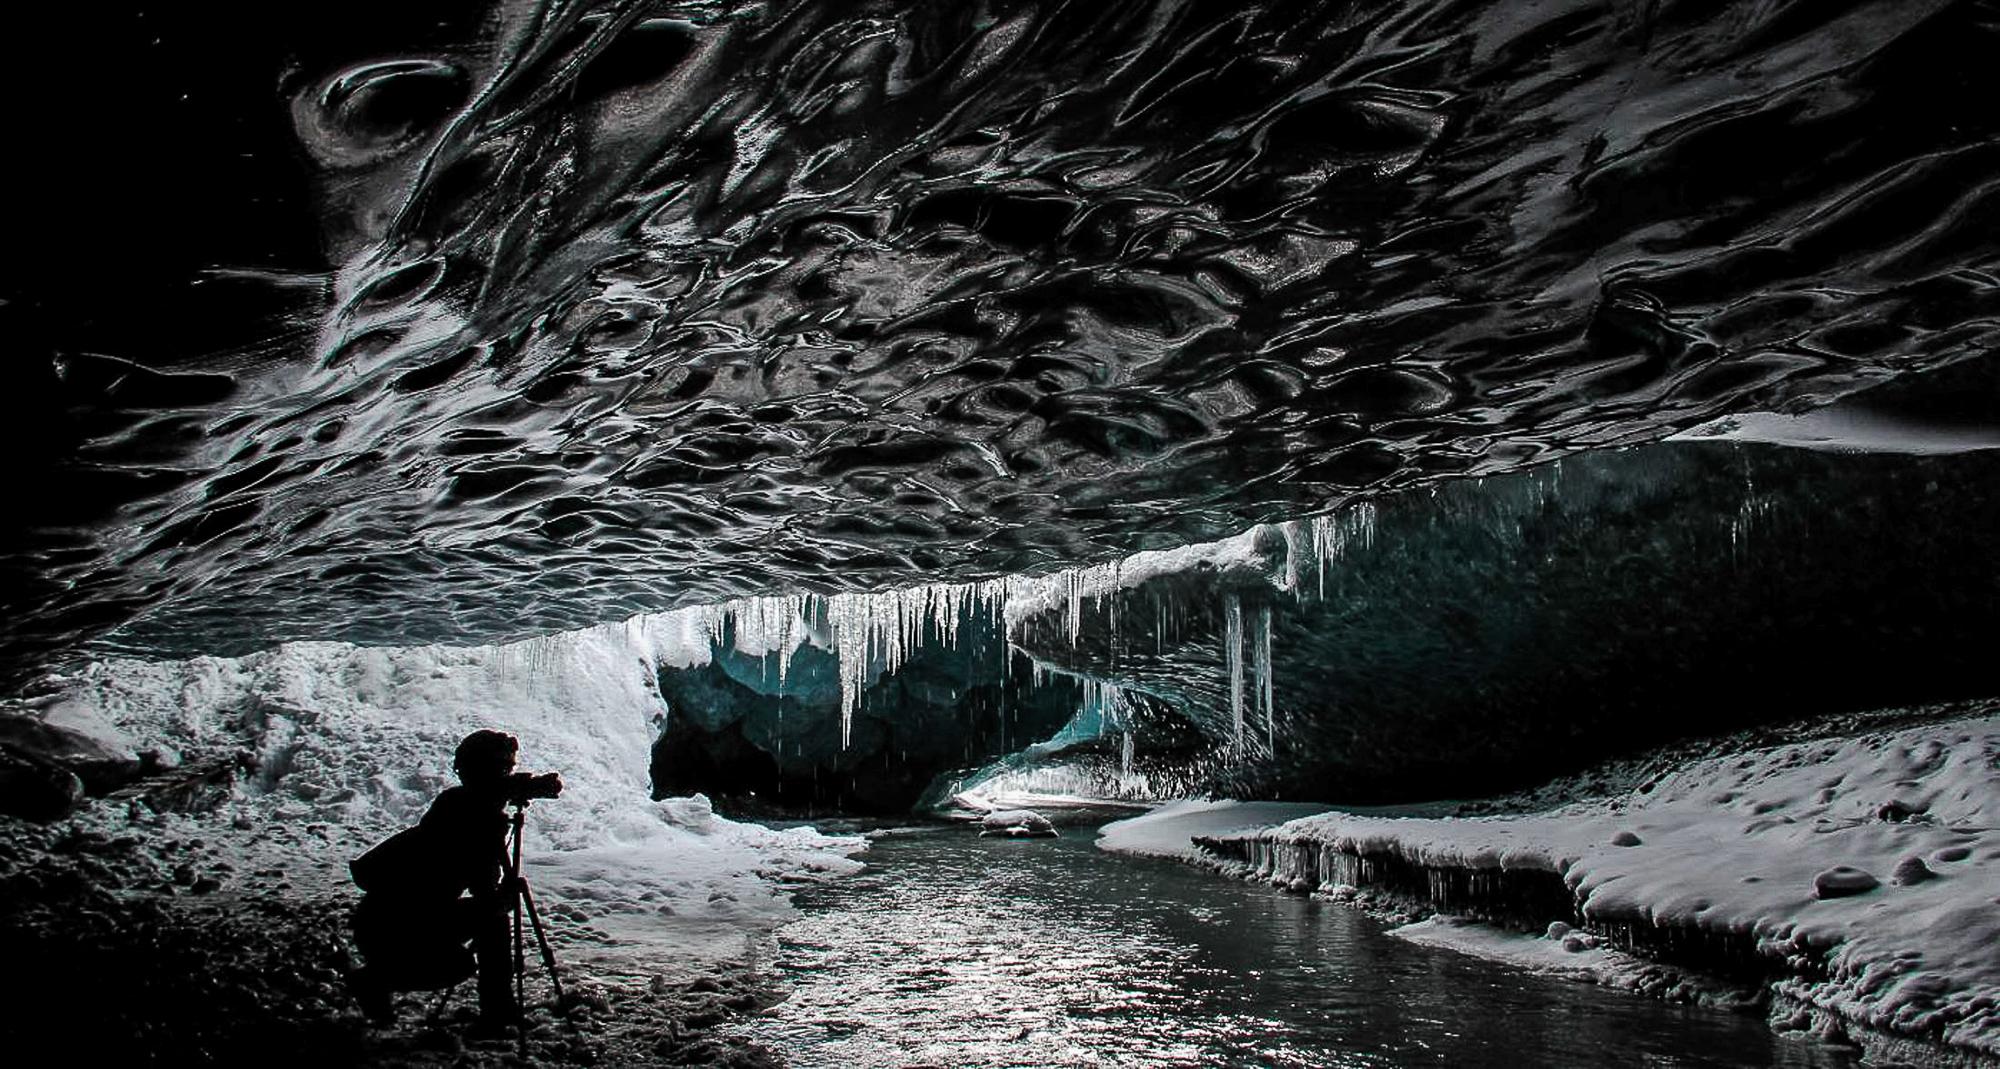 IceCavesJONAA©Agust Runarsson-35.jpg